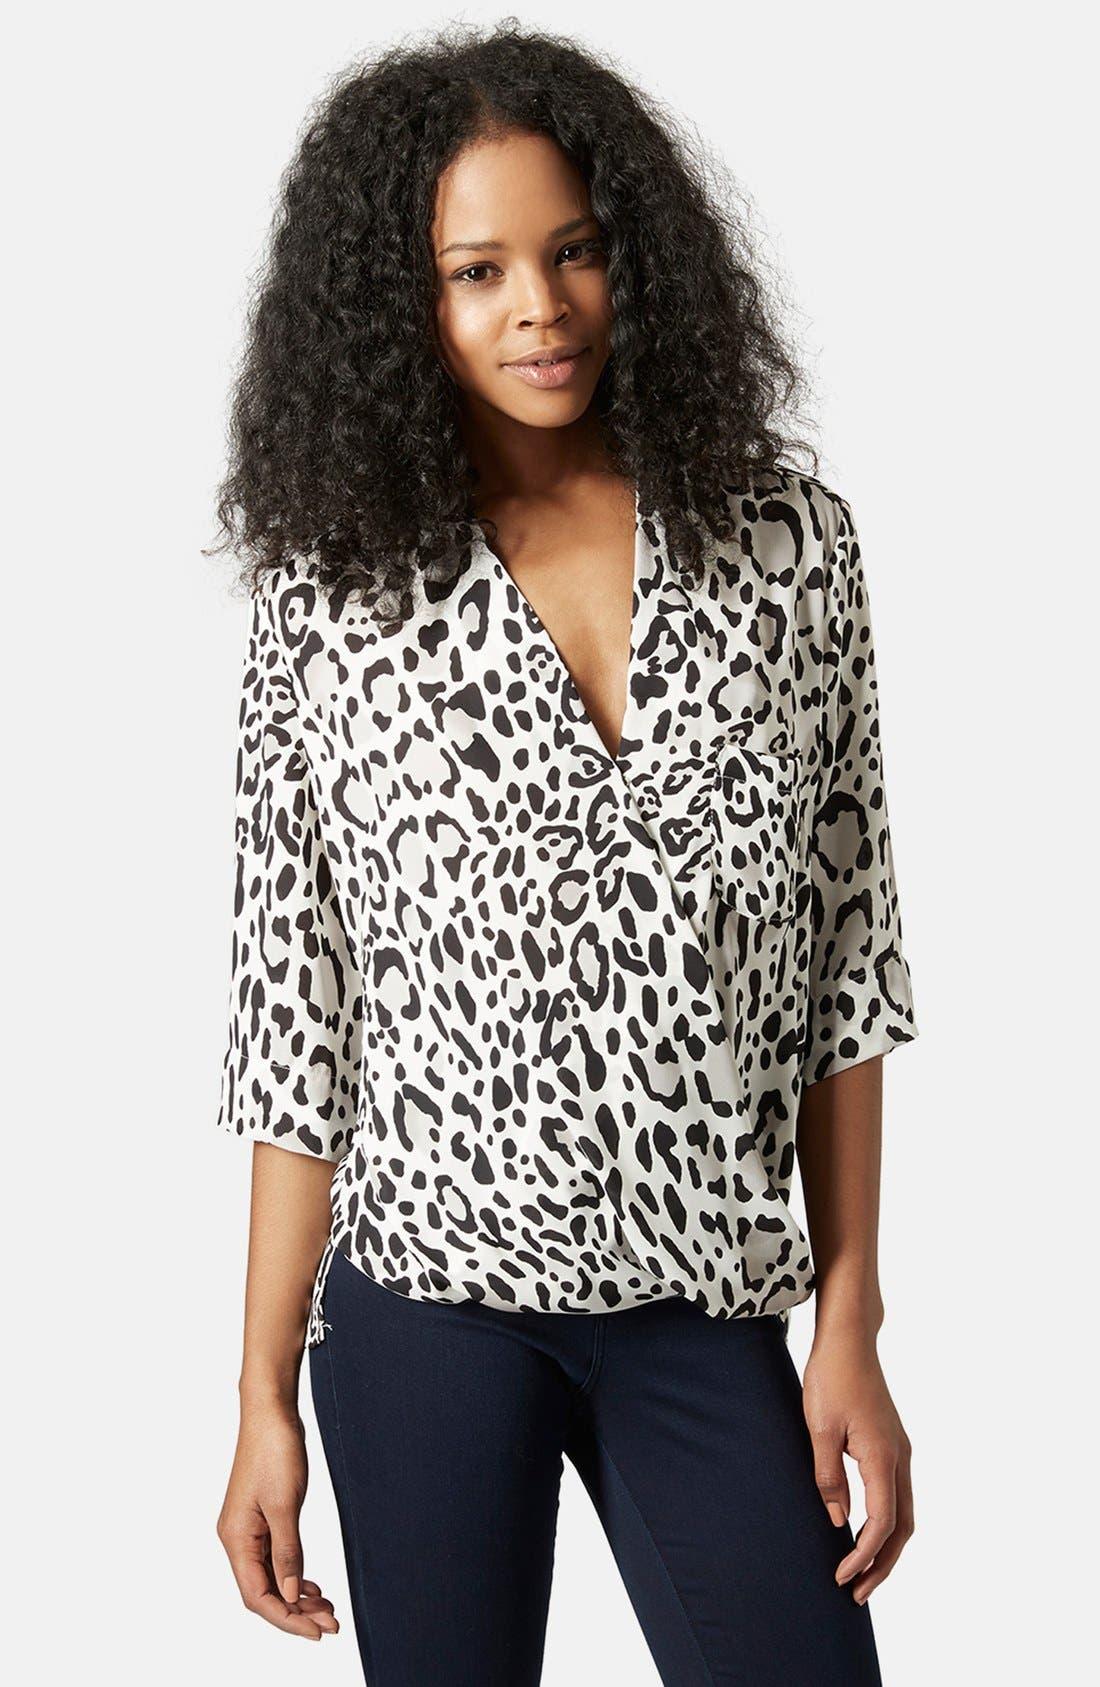 Alternate Image 1 Selected - Topshop Leopard Print Surplice Top